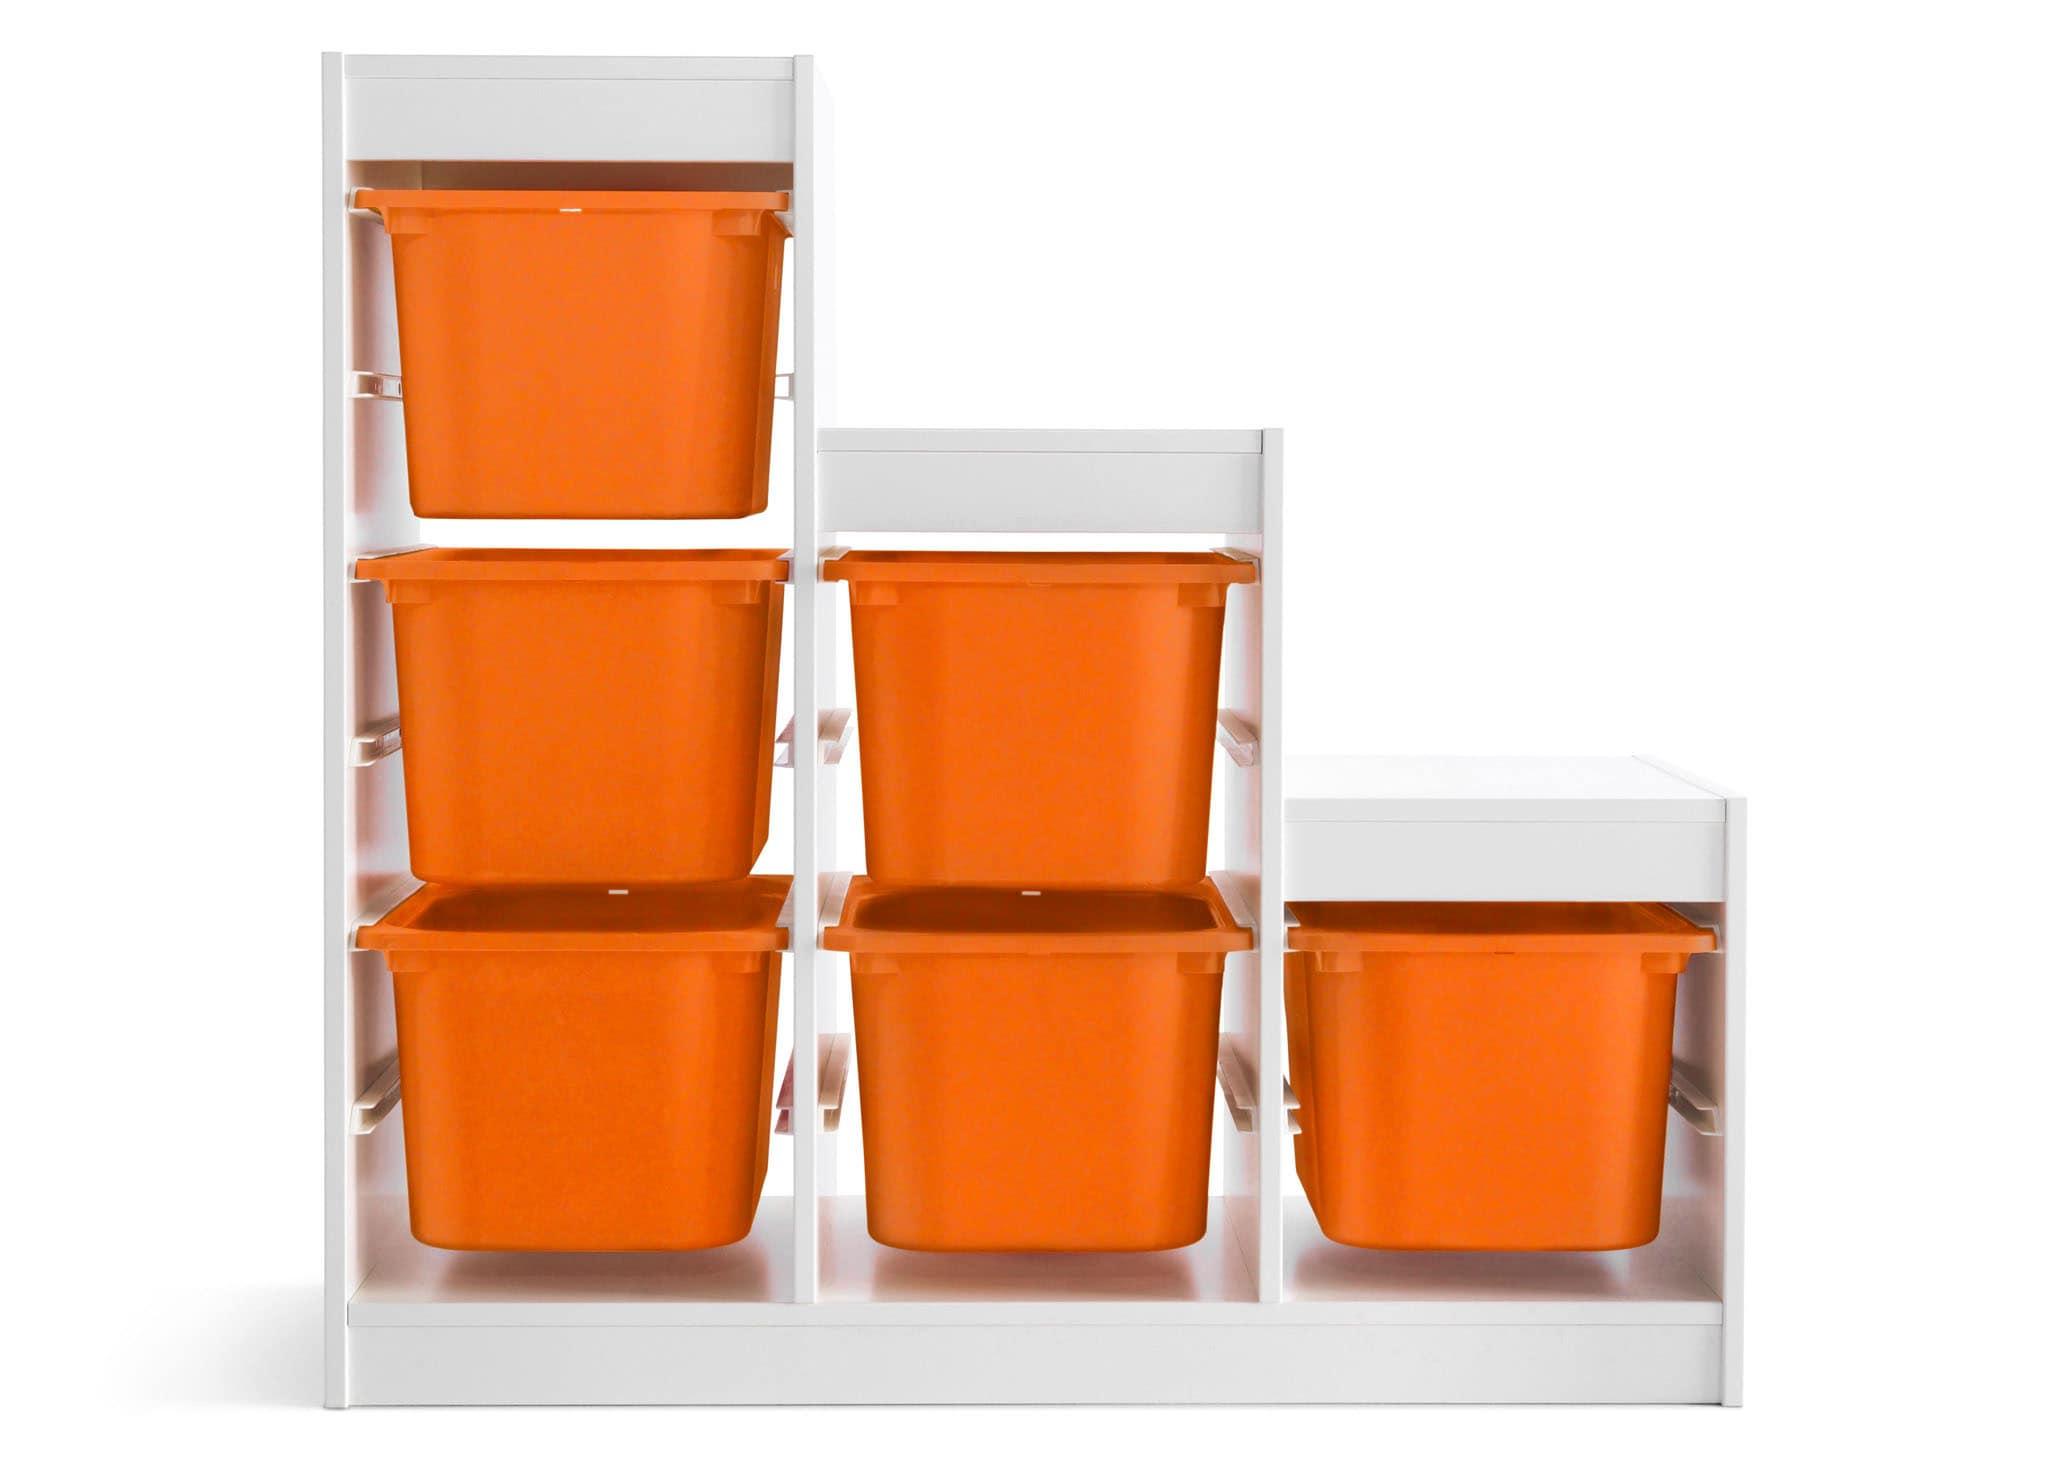 Ikea Muebles Almacenaje U3dh Muebles Infantiles Y Almacenaje Para Nià Os Pra Online Ikea